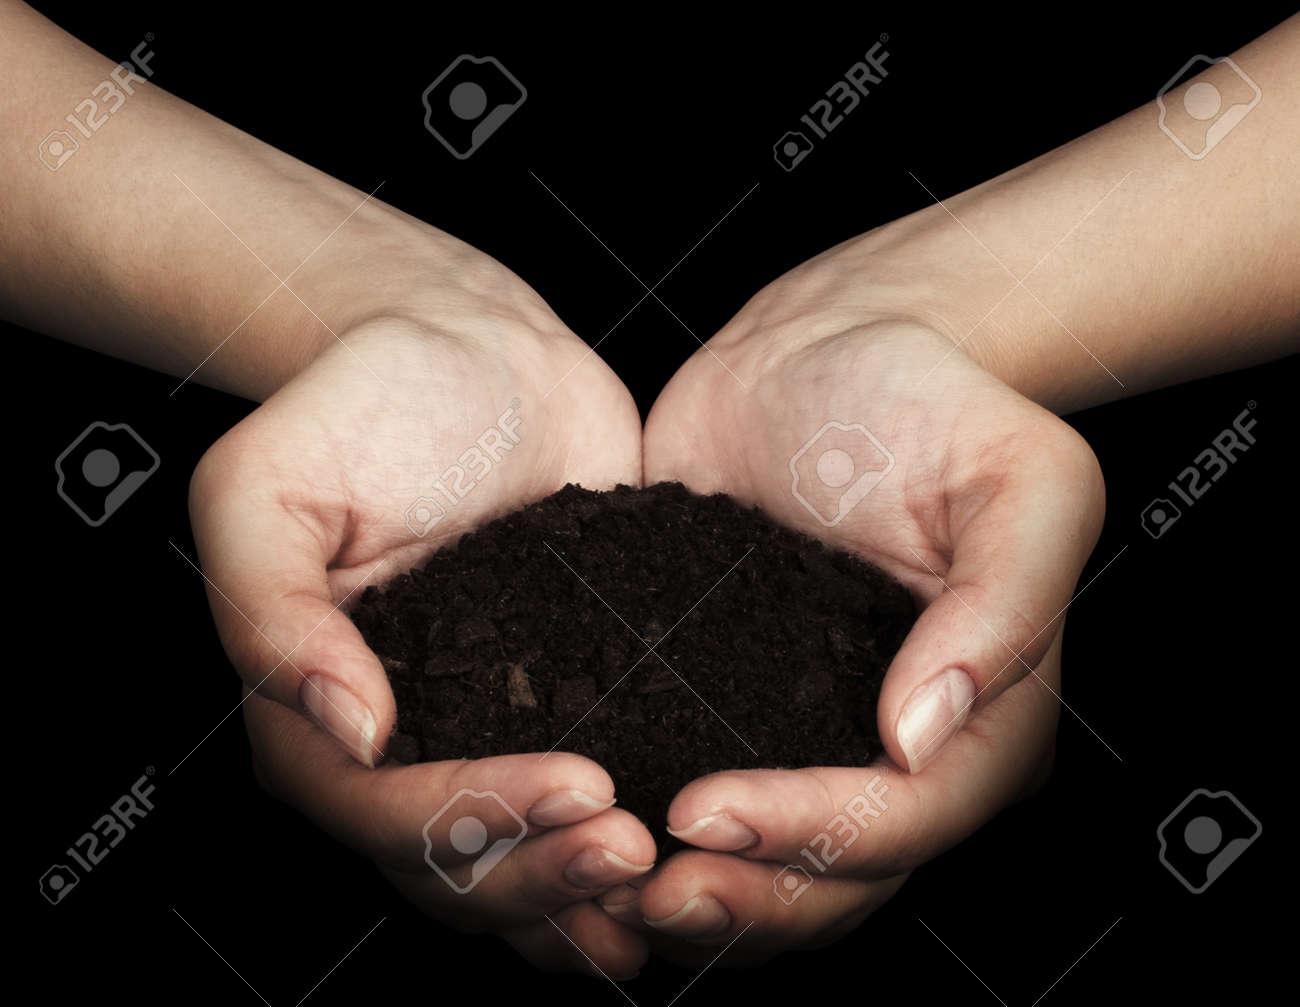 Brown Land and humman hand  on hand Stock Photo - 17370031